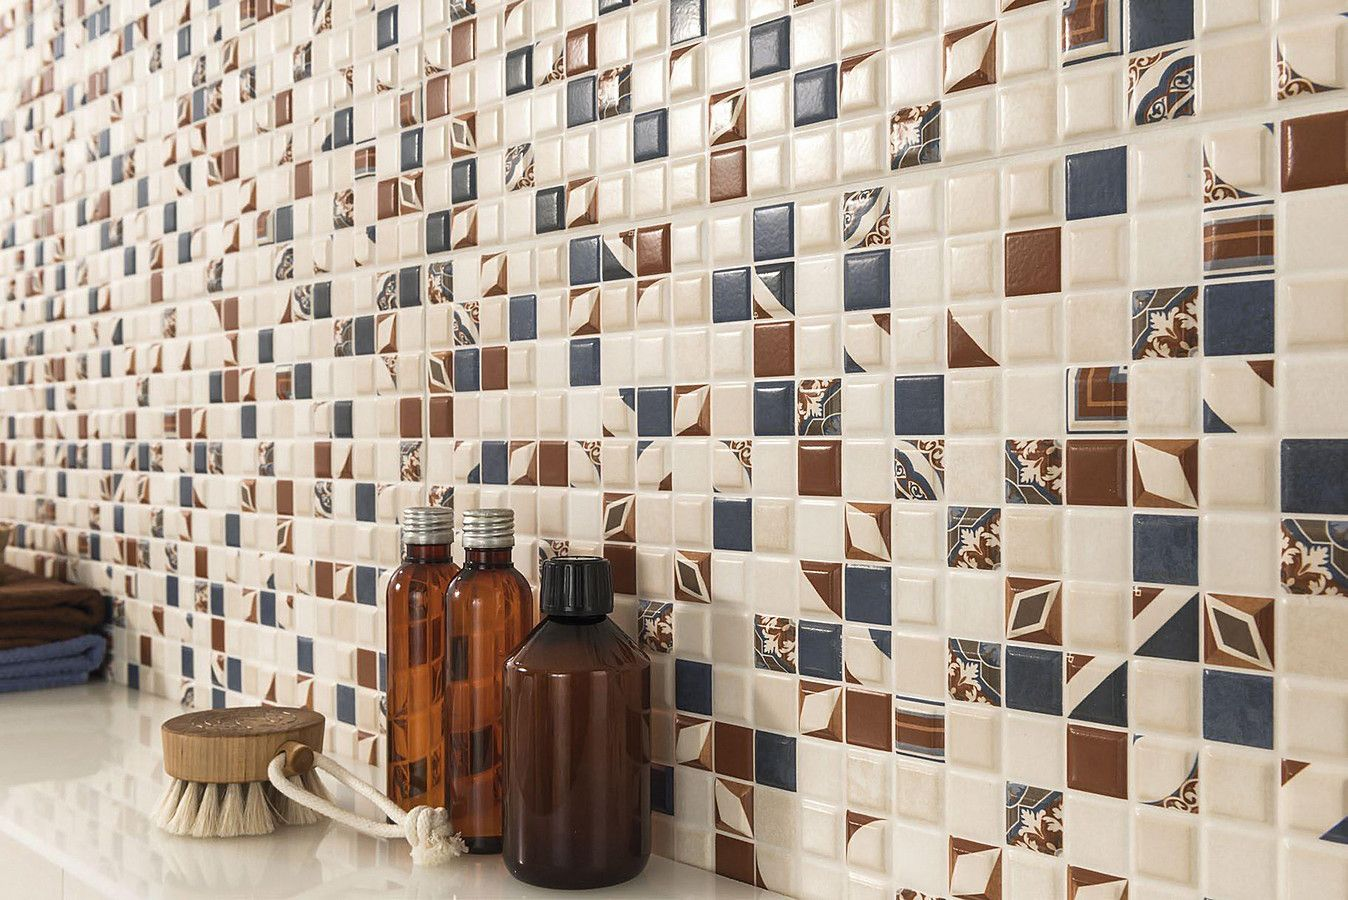 Century unlimited villeroy boch publieke ruimten badkamer